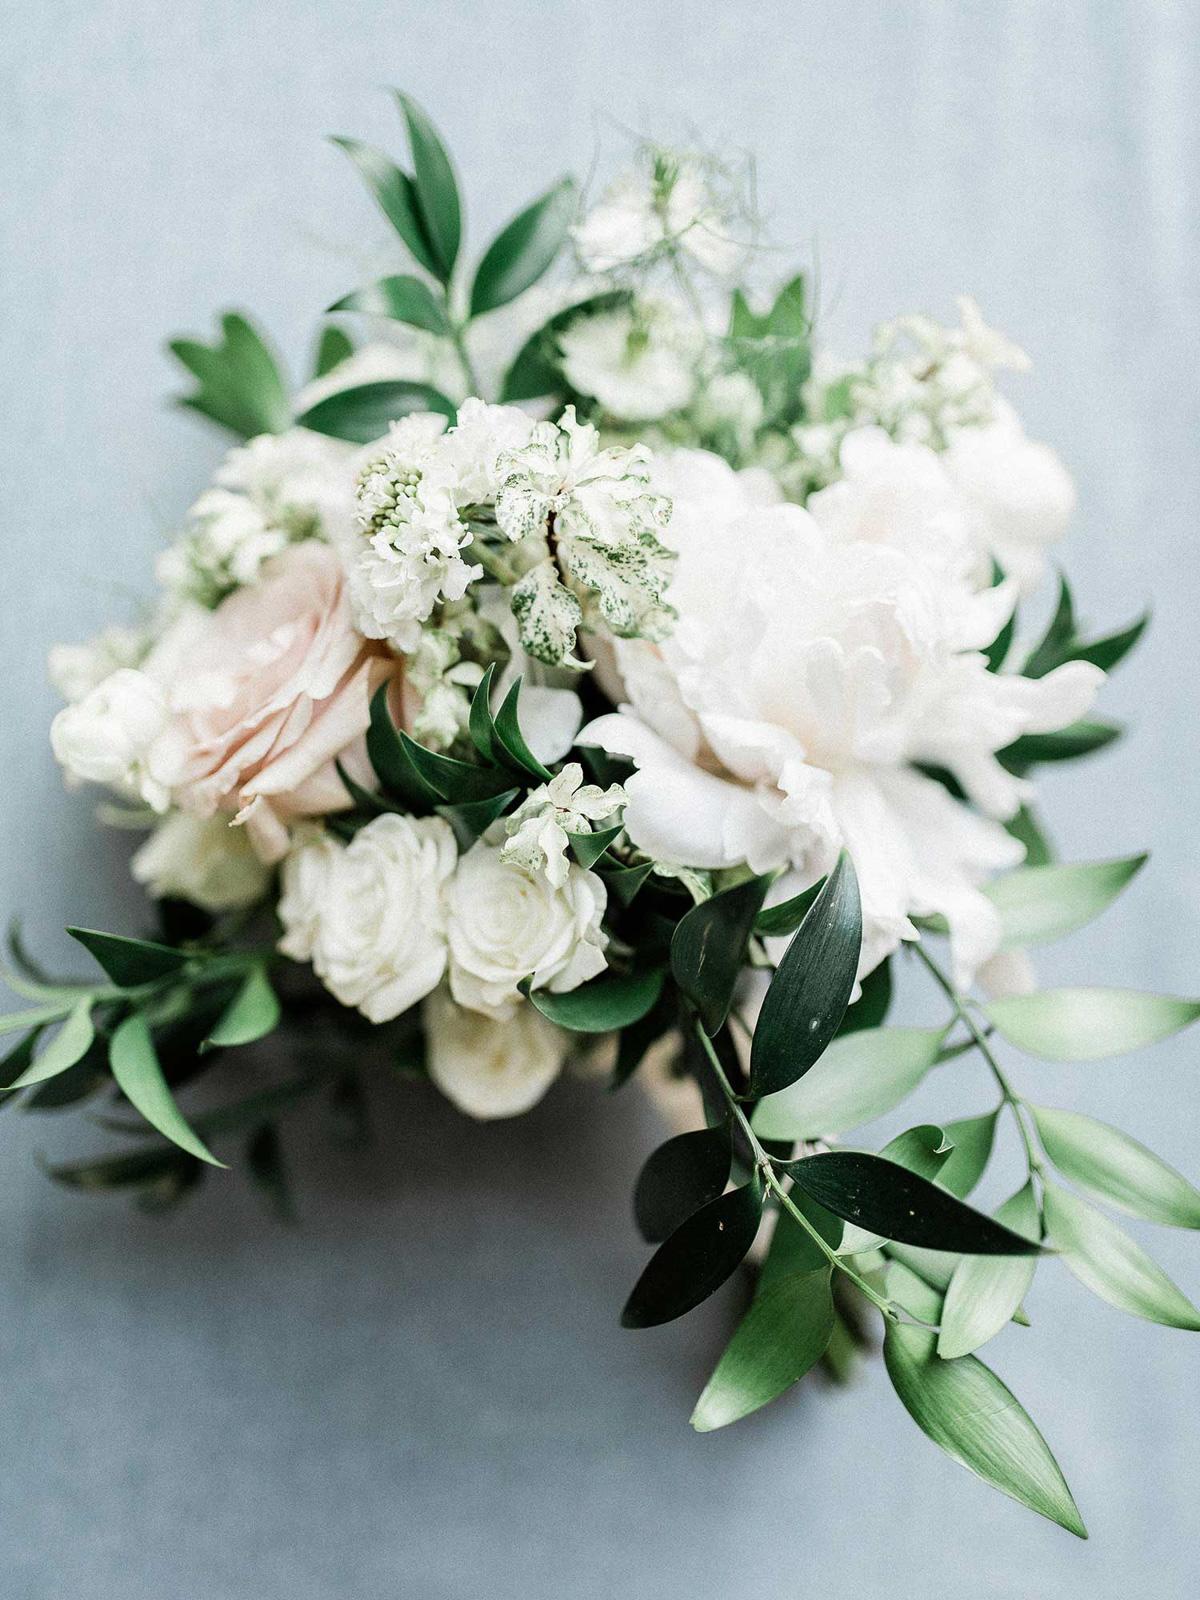 destiny-dawn-photography-vineyard-bride-swish-list-knollwood-golf-and-country-club-ancaster-wedding-editorial-39.jpg